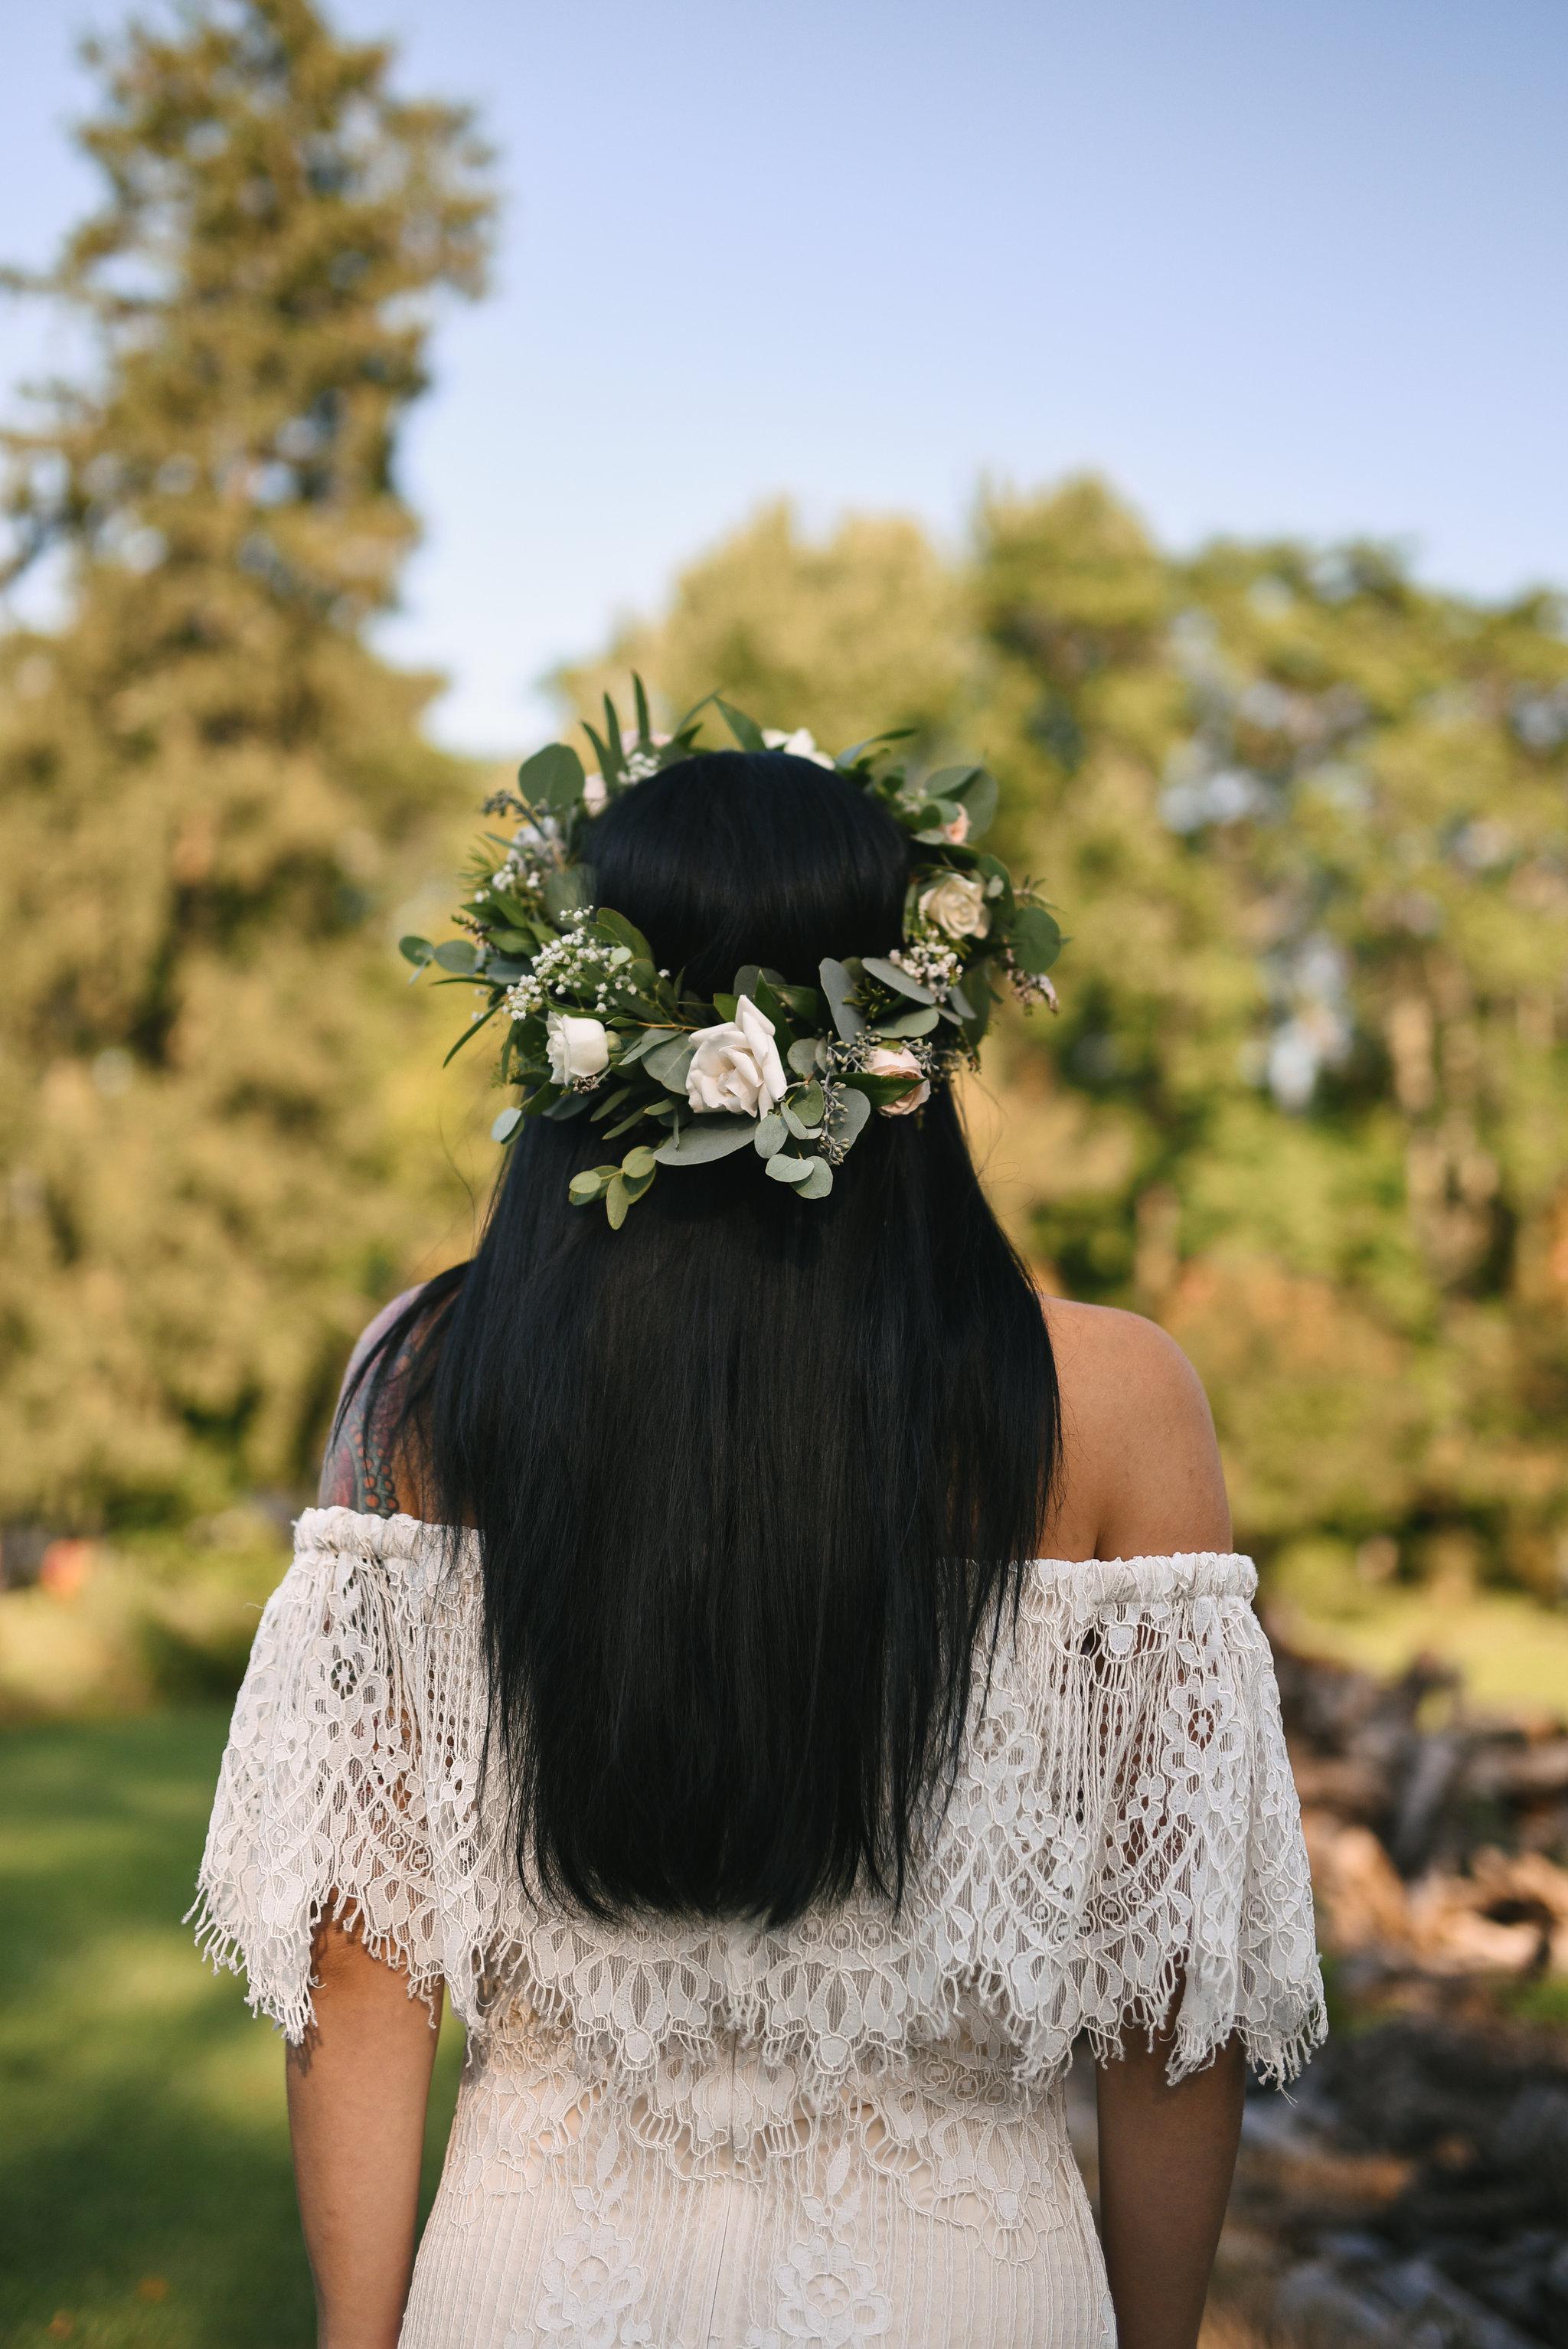 Maryland, Eastern Shore, Baltimore Wedding Photographer, Romantic, Boho, Backyard Wedding, Nature, White Rose Flower Crown, Lace Daughters of Simone Wedding Dress, Bridal Hair